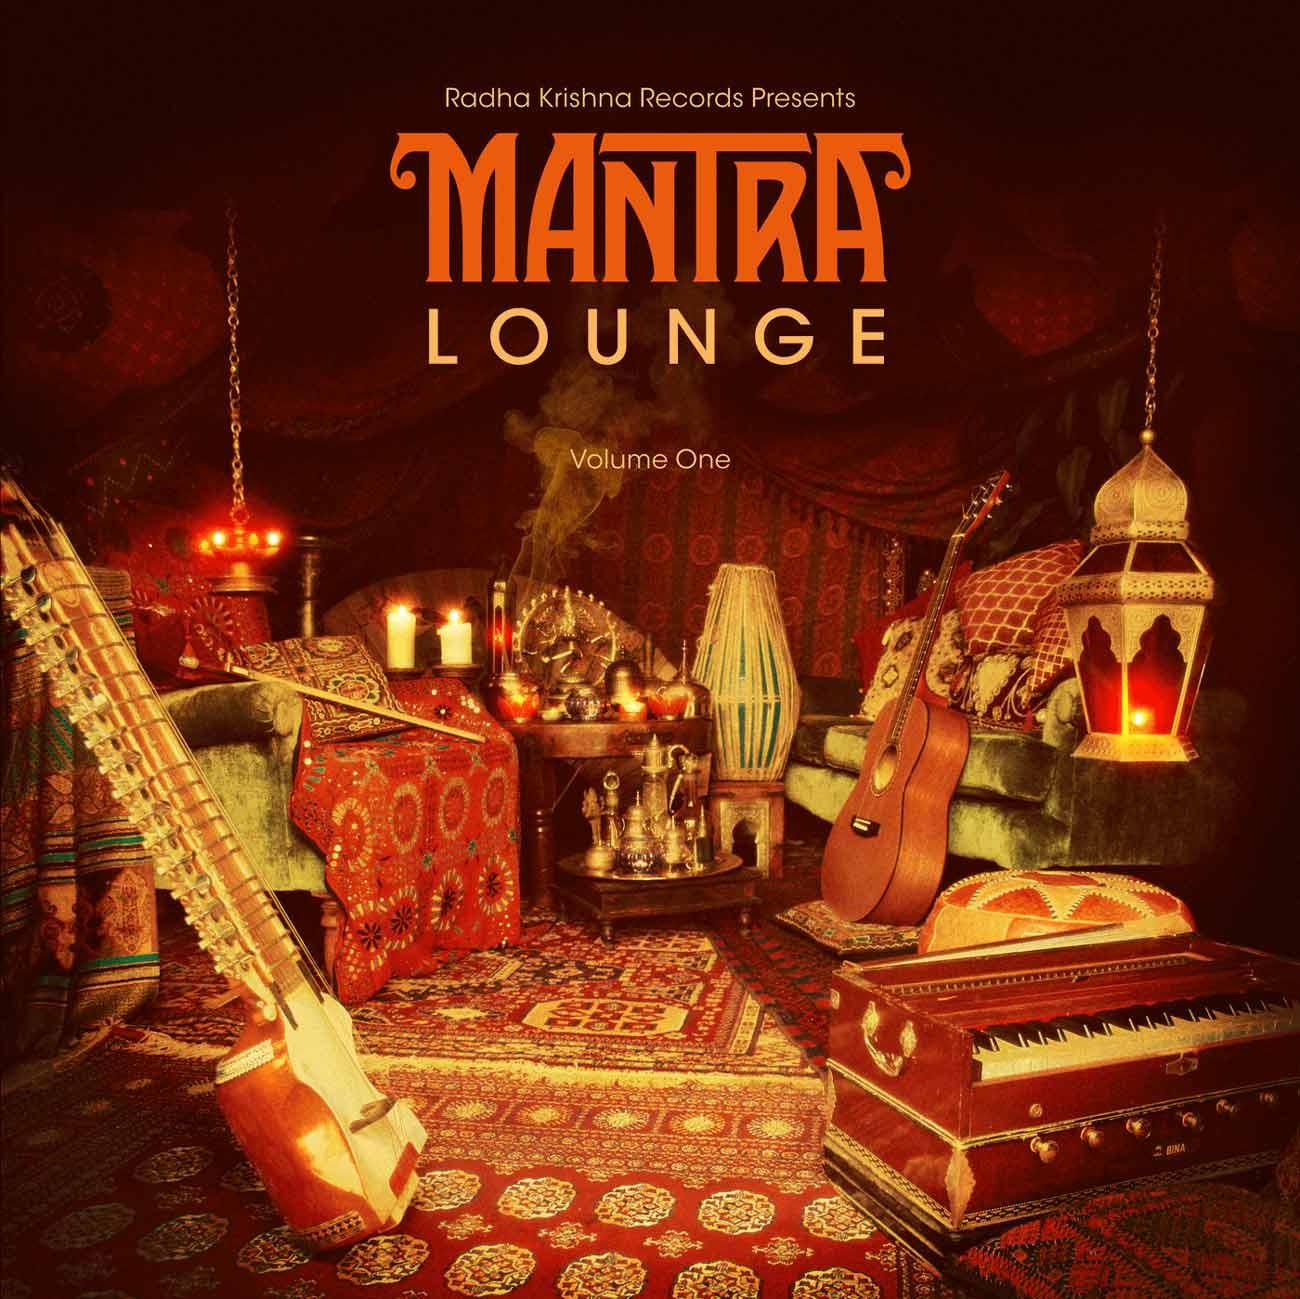 Mantra Lounge CD finished cover design